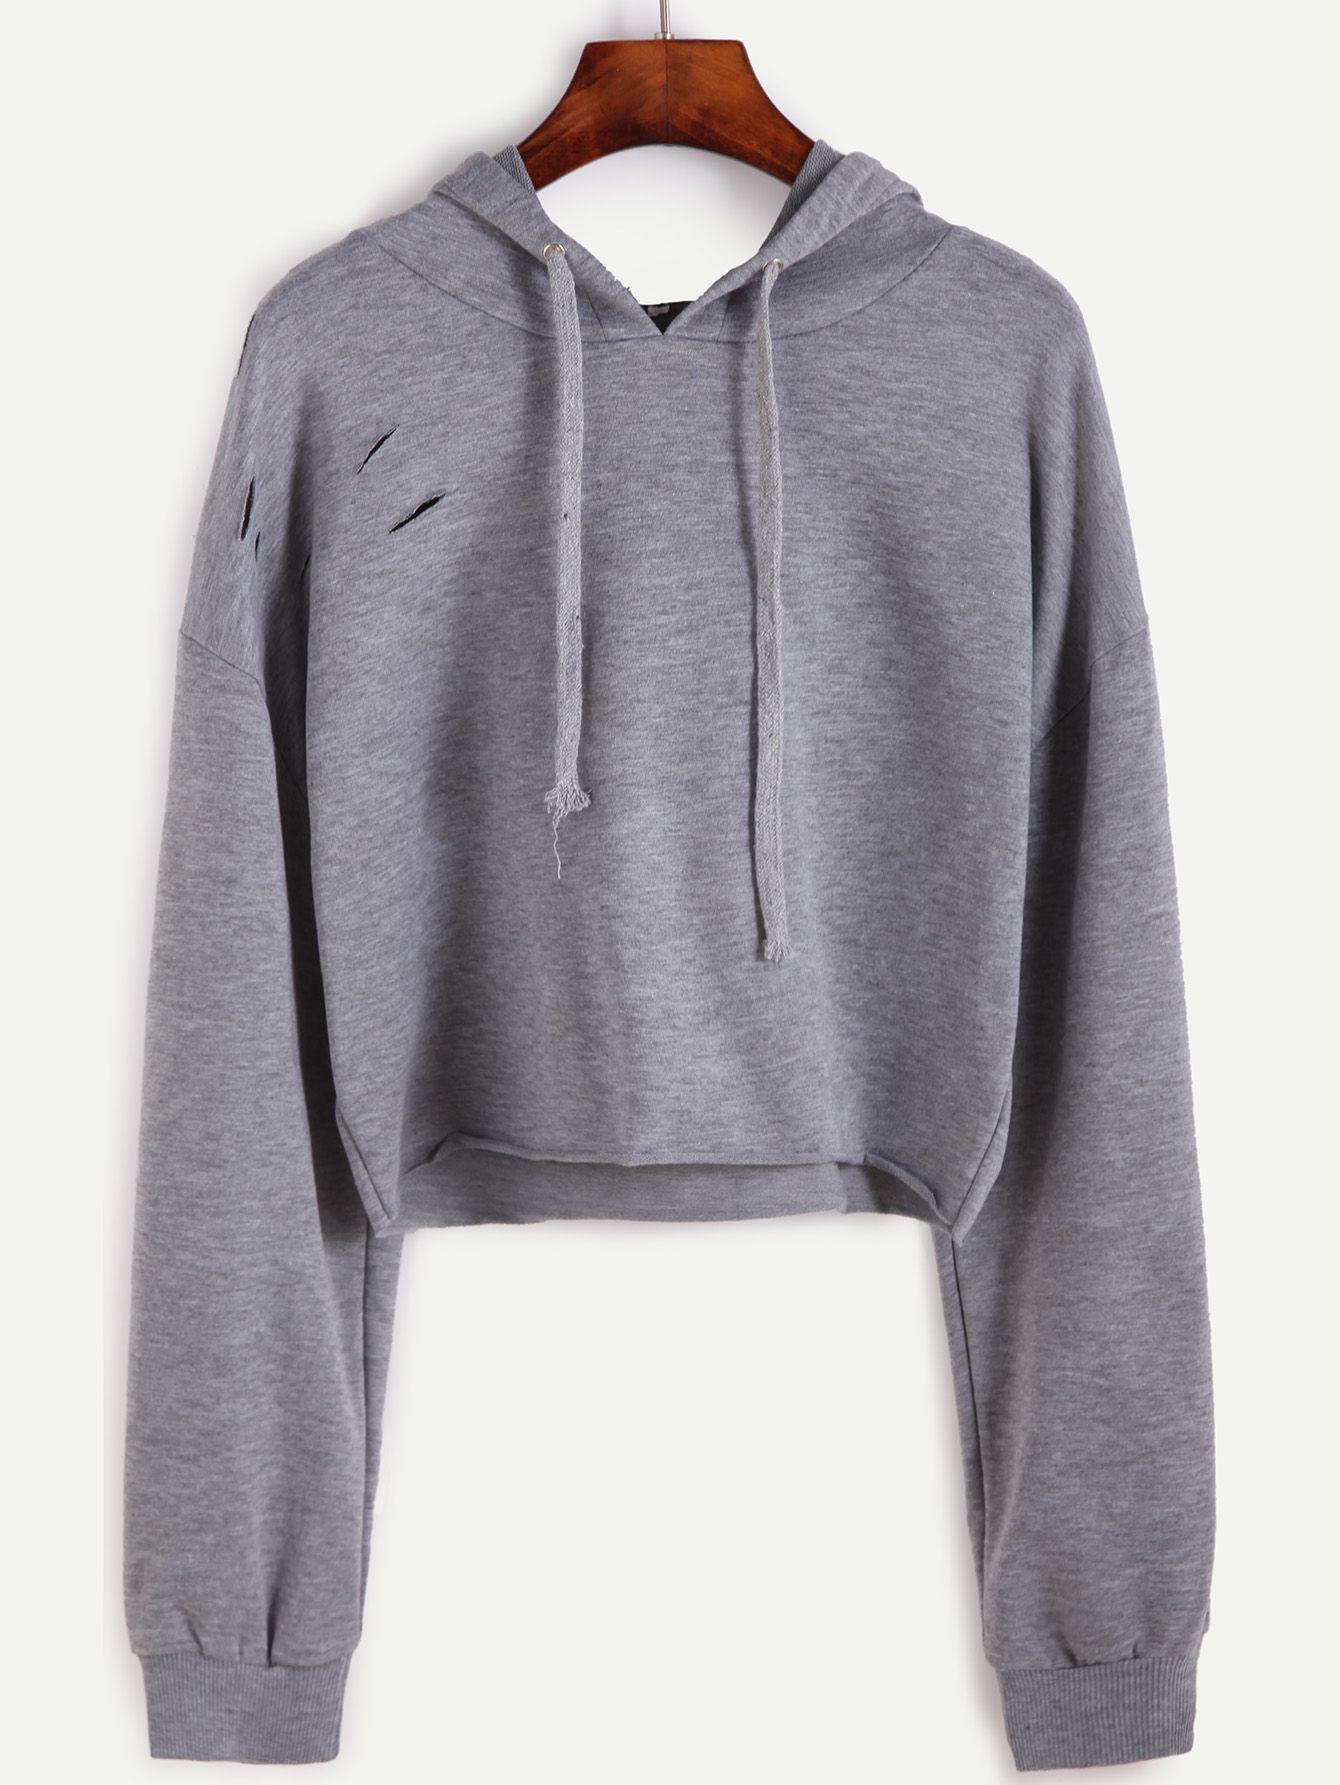 209adb66a2d Drop Shoulder Ripped Drawstring Hooded Crop Sweatshirt